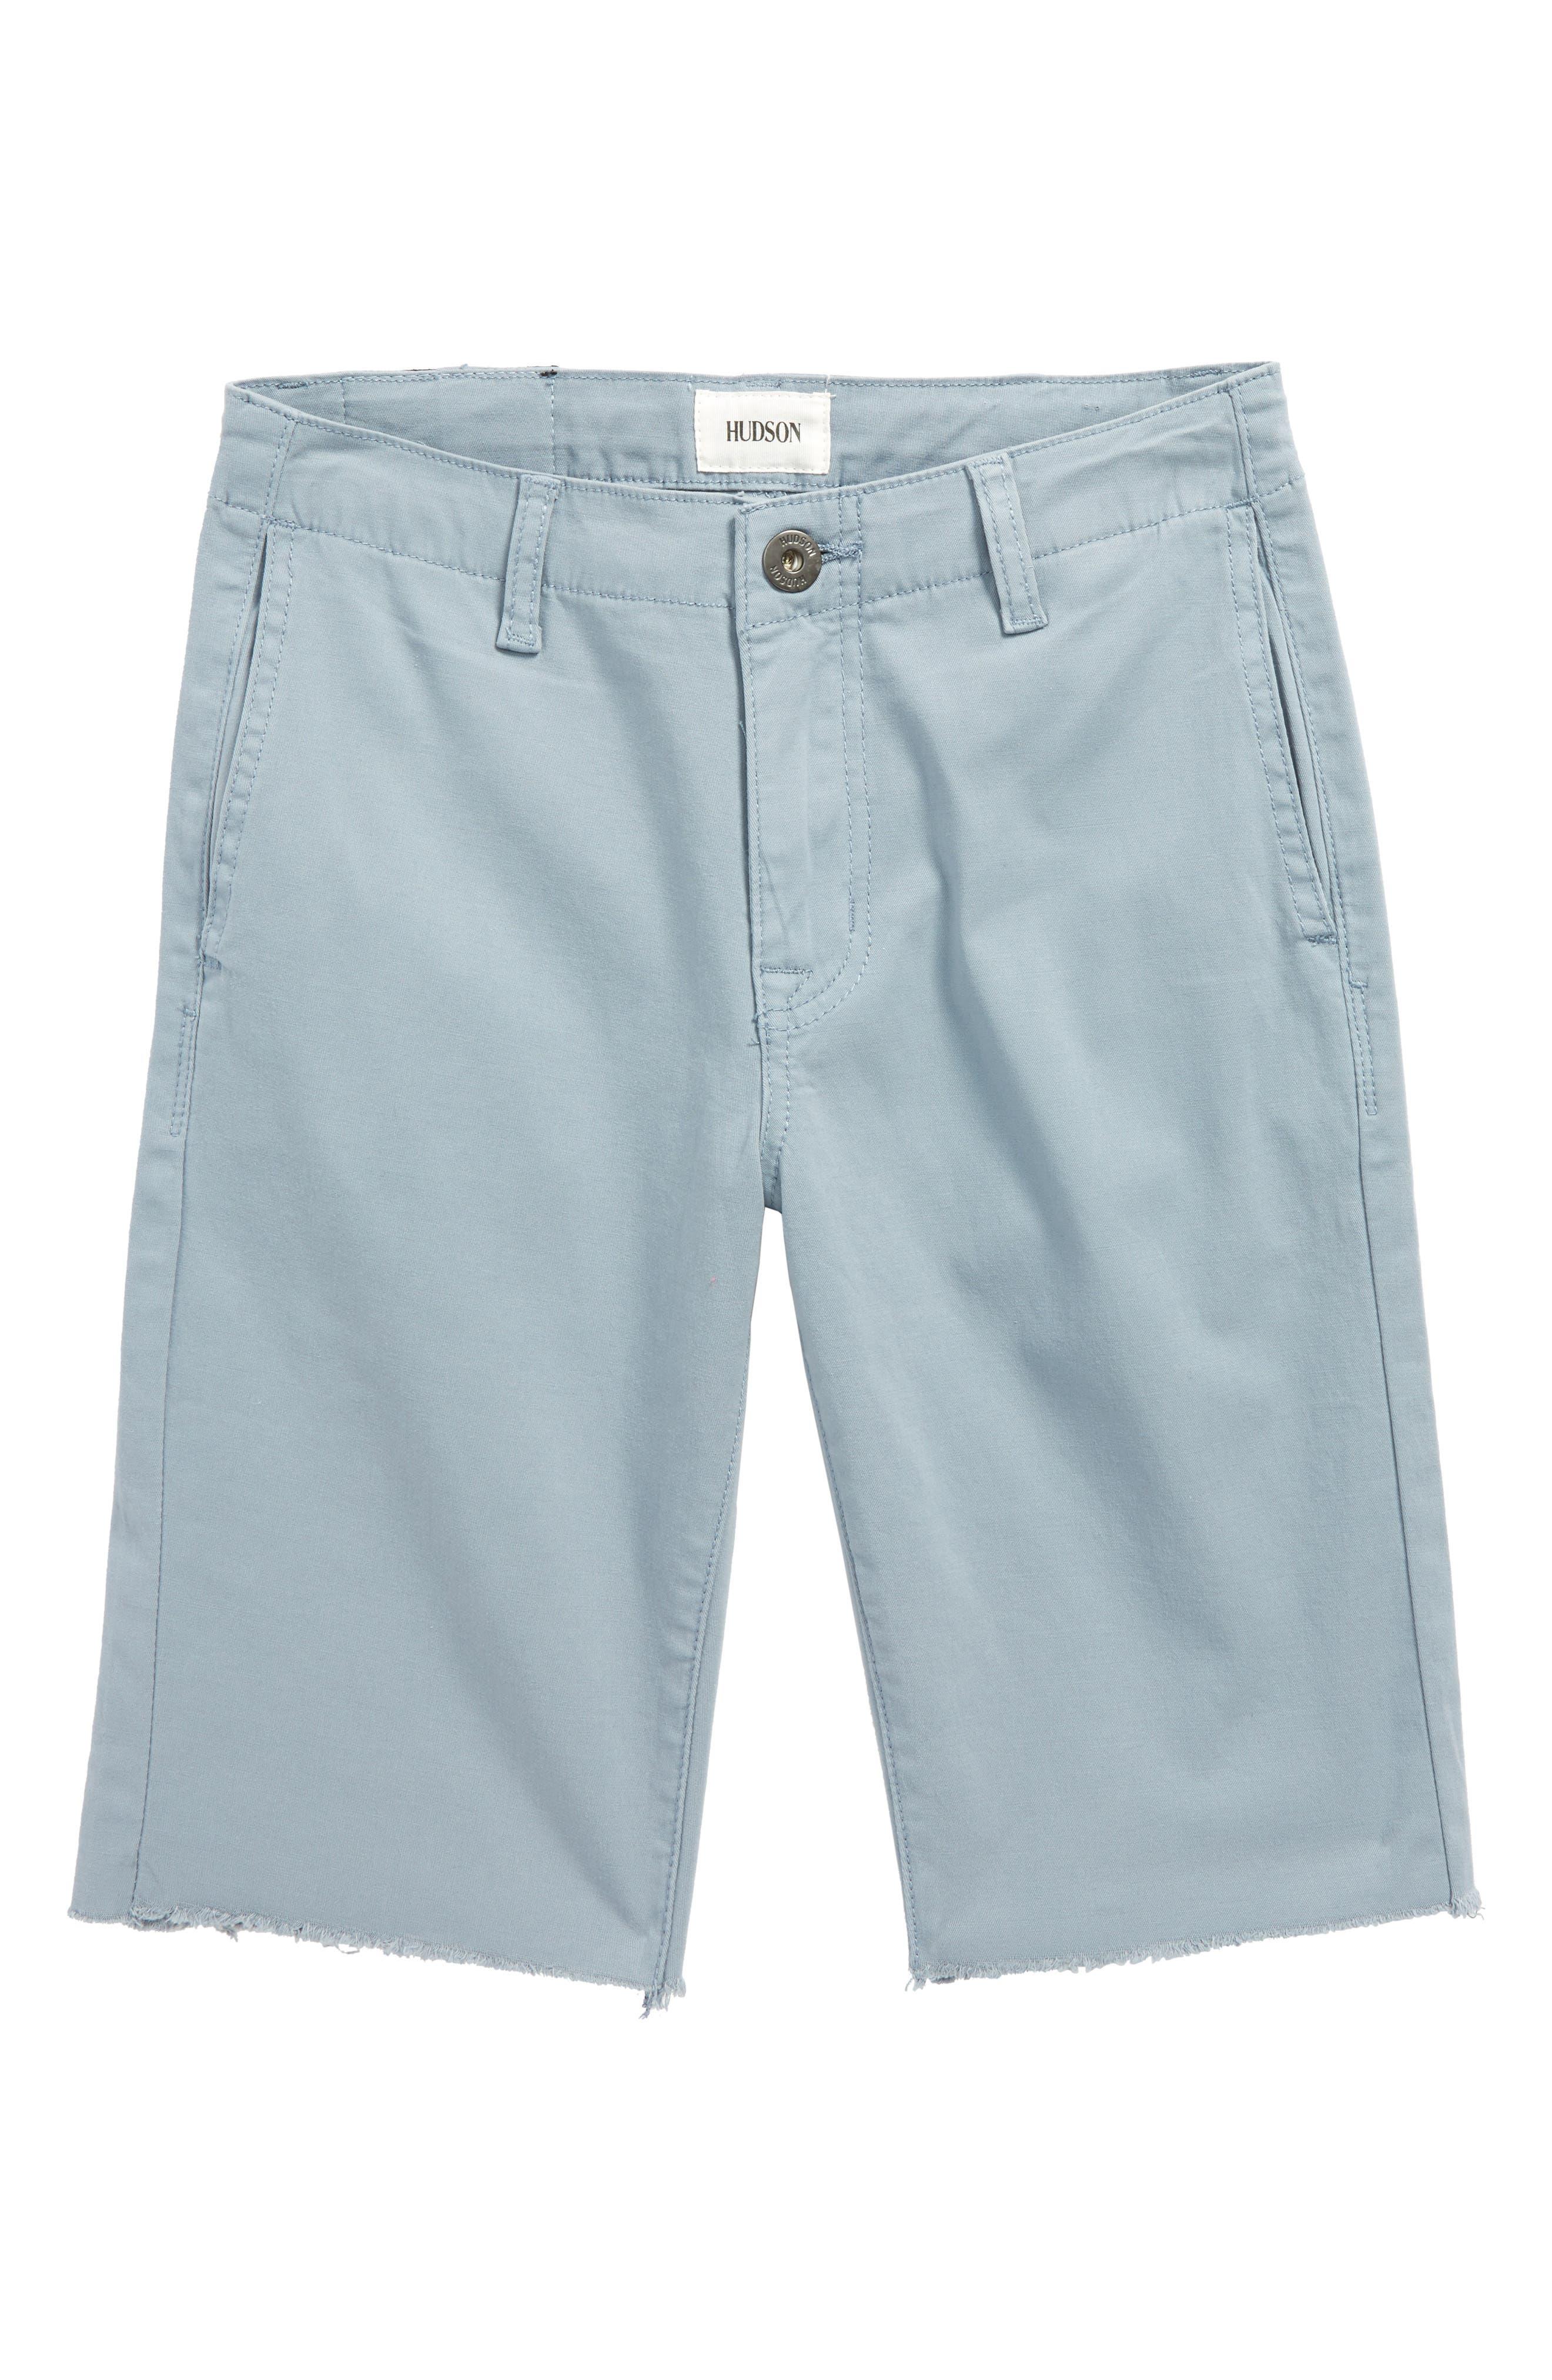 Beach Daze Shorts,                             Main thumbnail 1, color,                             Powder